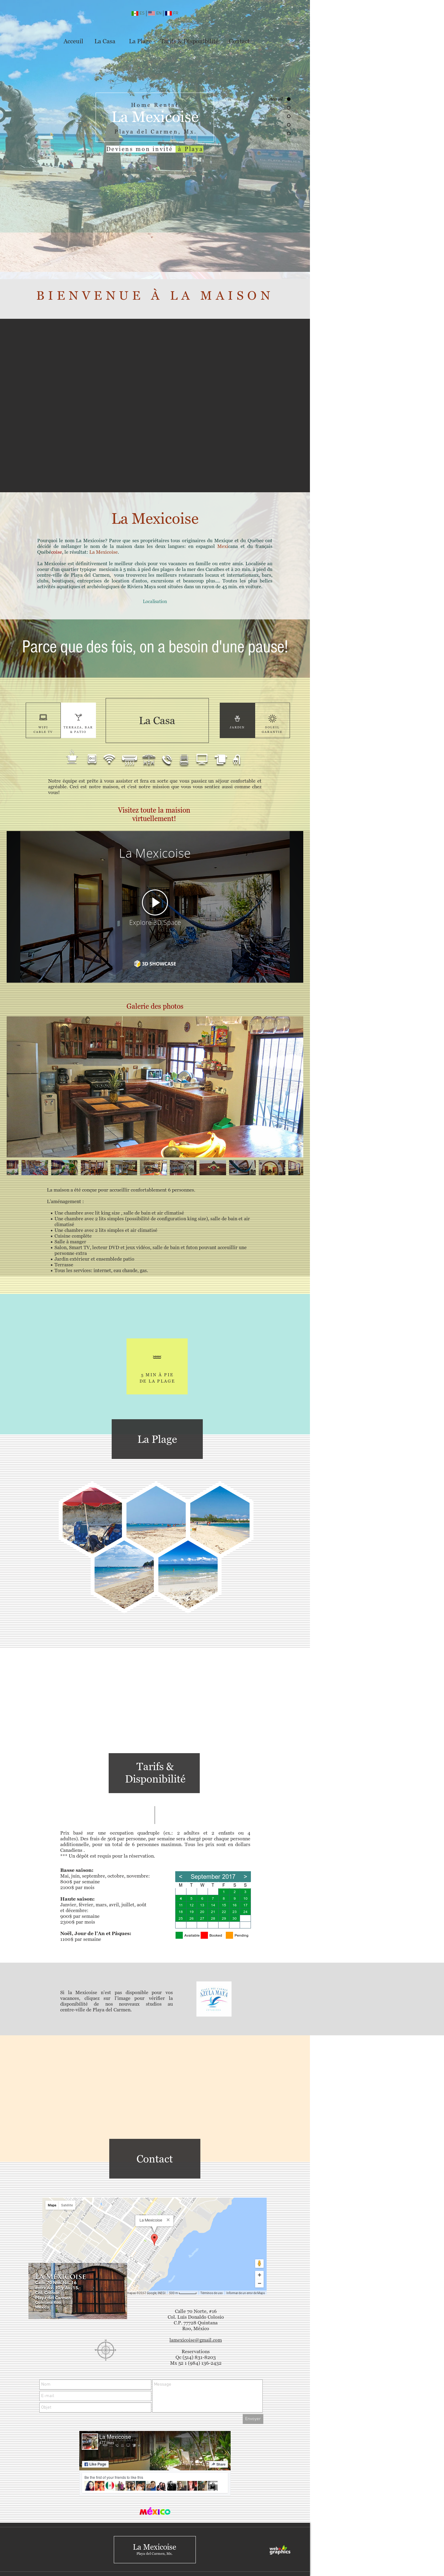 Salle De Bain King Size ~ la mexicoise competitors revenue and employees owler company profile